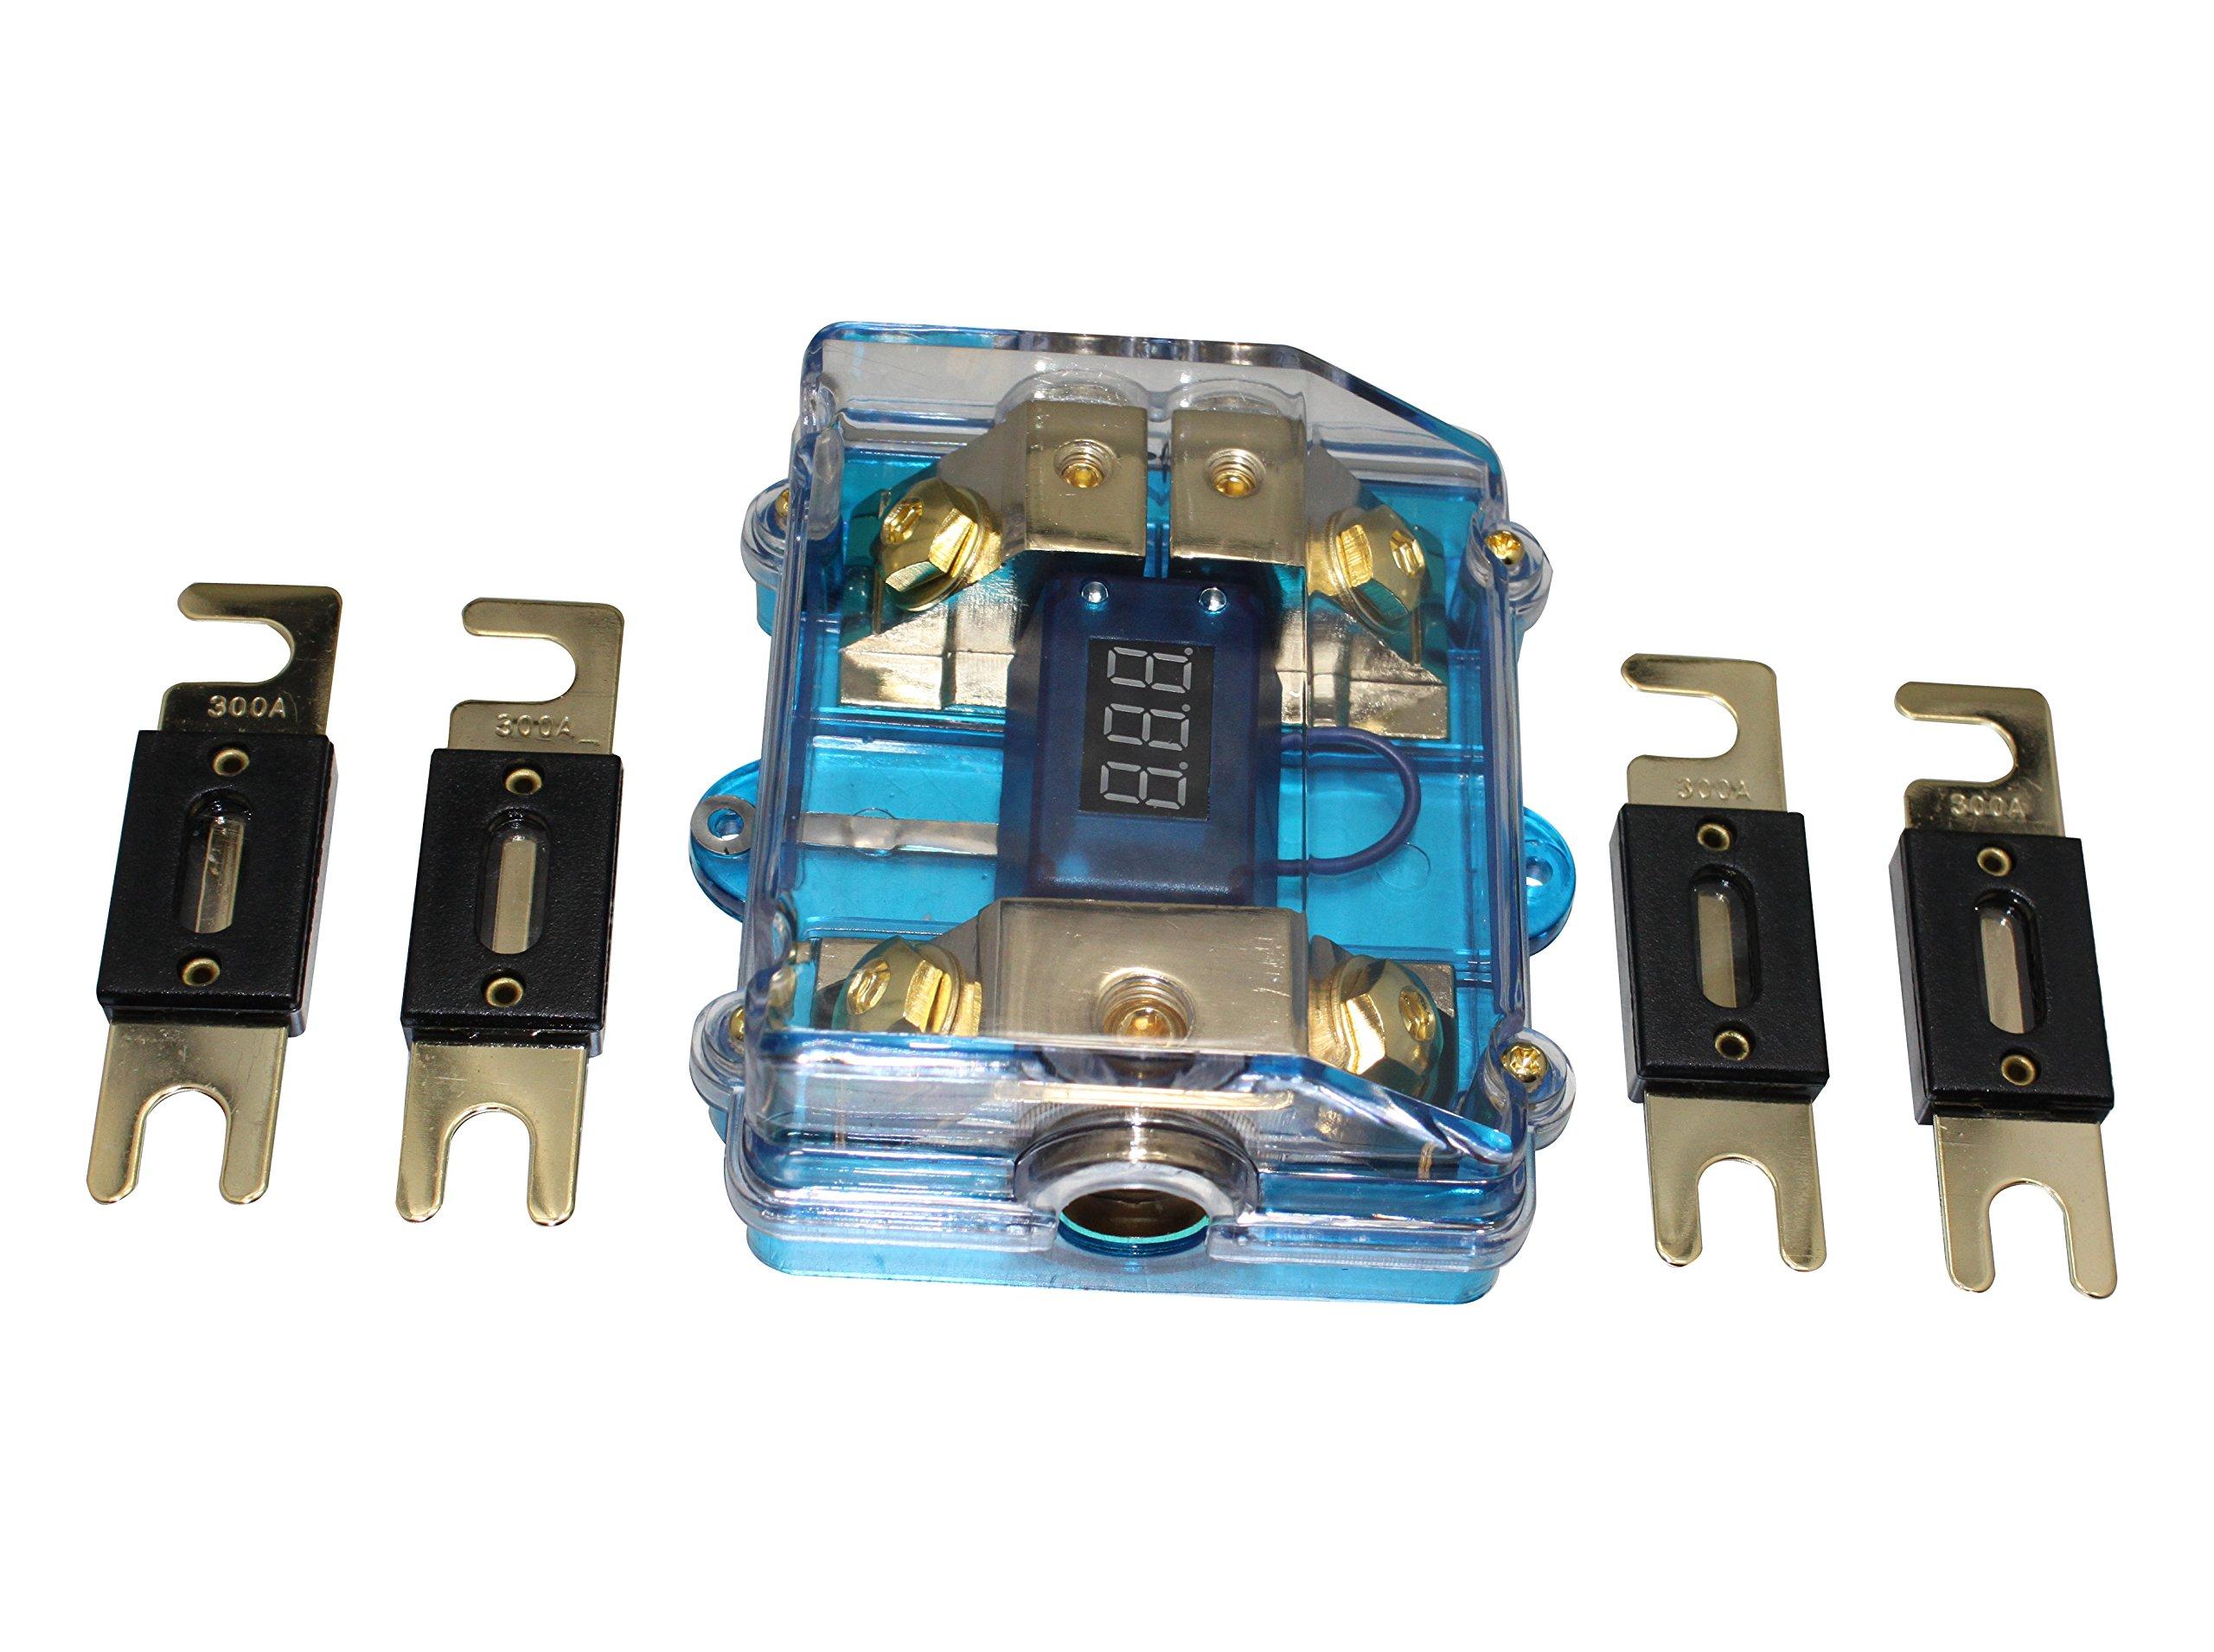 500A ANL Dual Digital Platinum ANL Distribution Block 0-4 Ga Fuse Holder